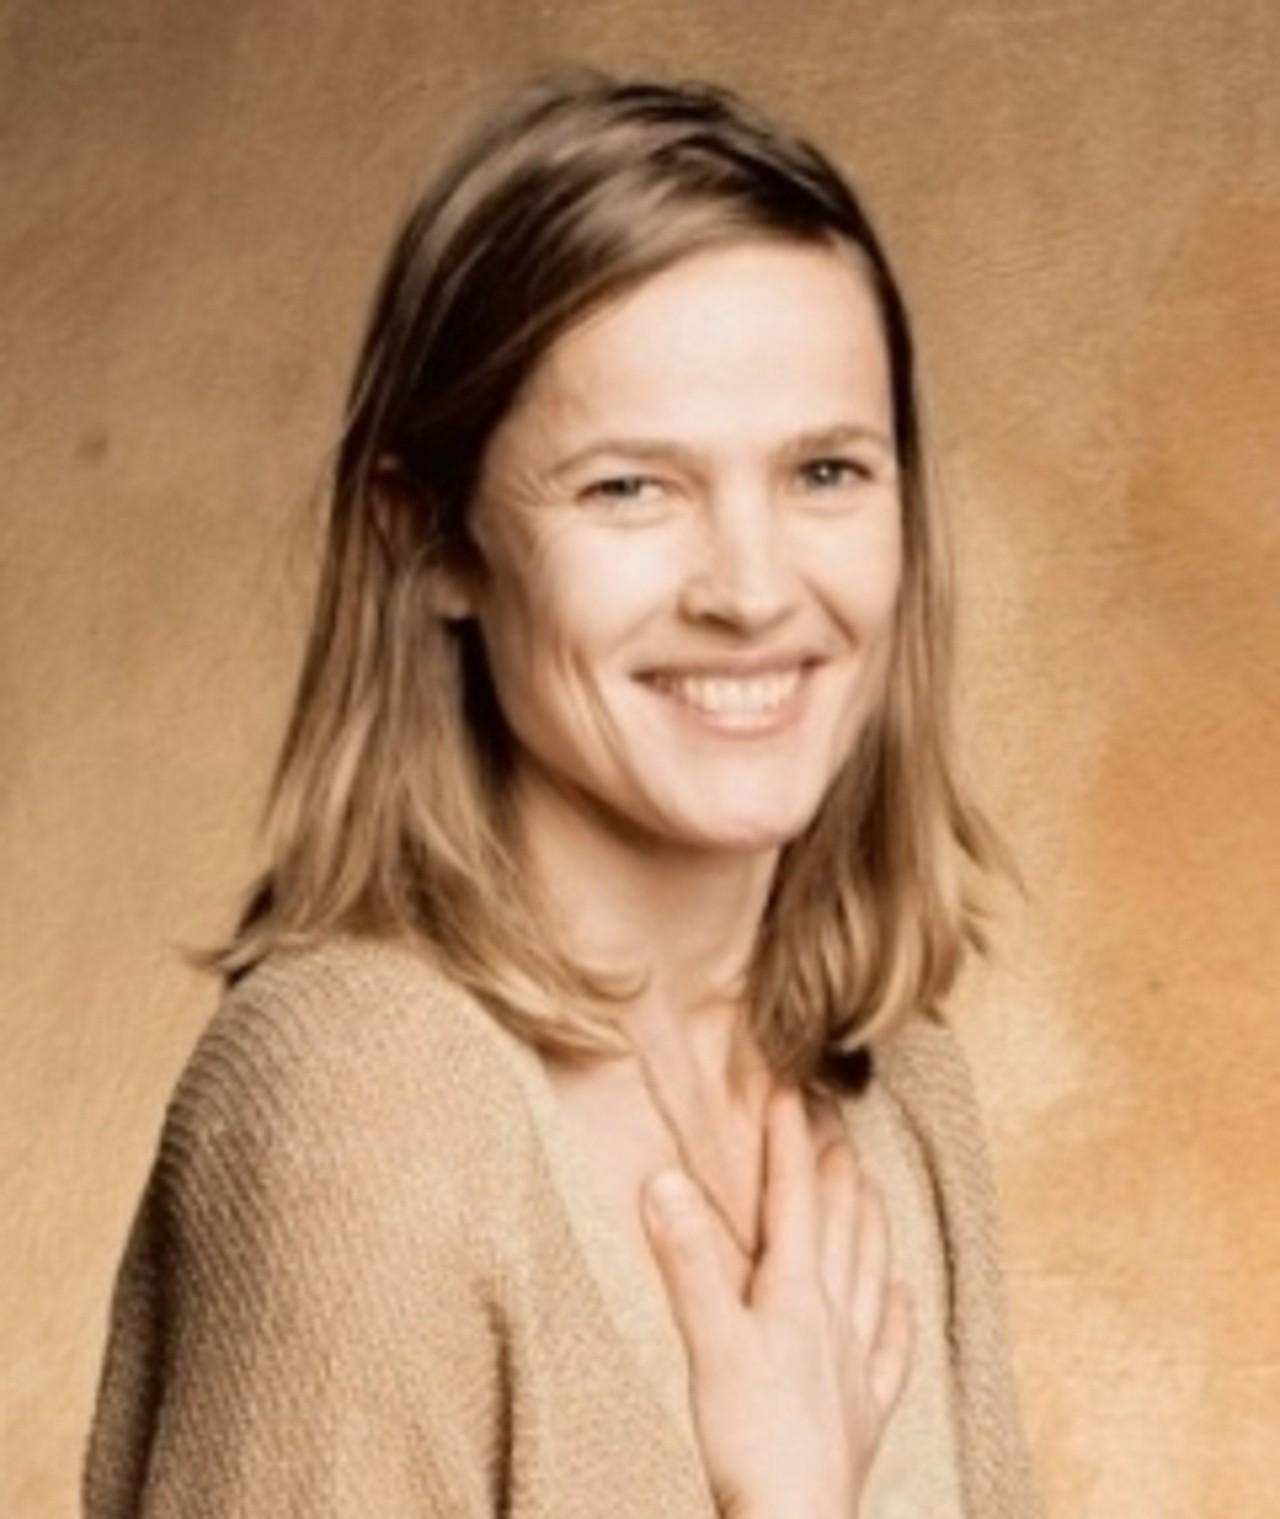 Karoline Eichhorn - Movies, Bio and Lists on MUBI